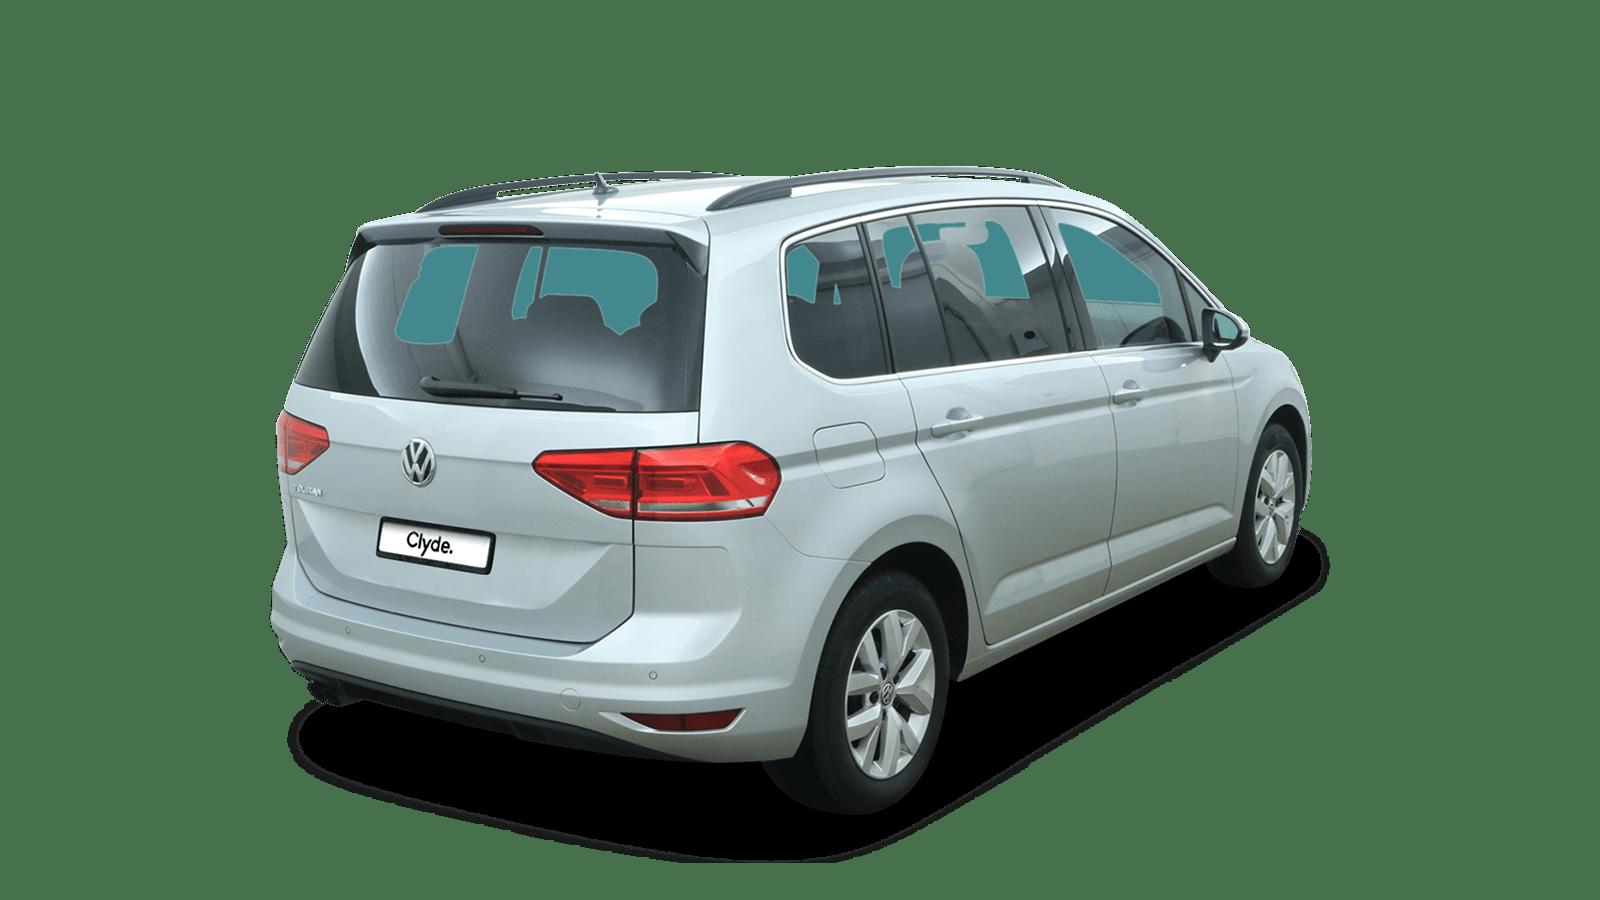 VW Touran Silver back - Clyde car subscription